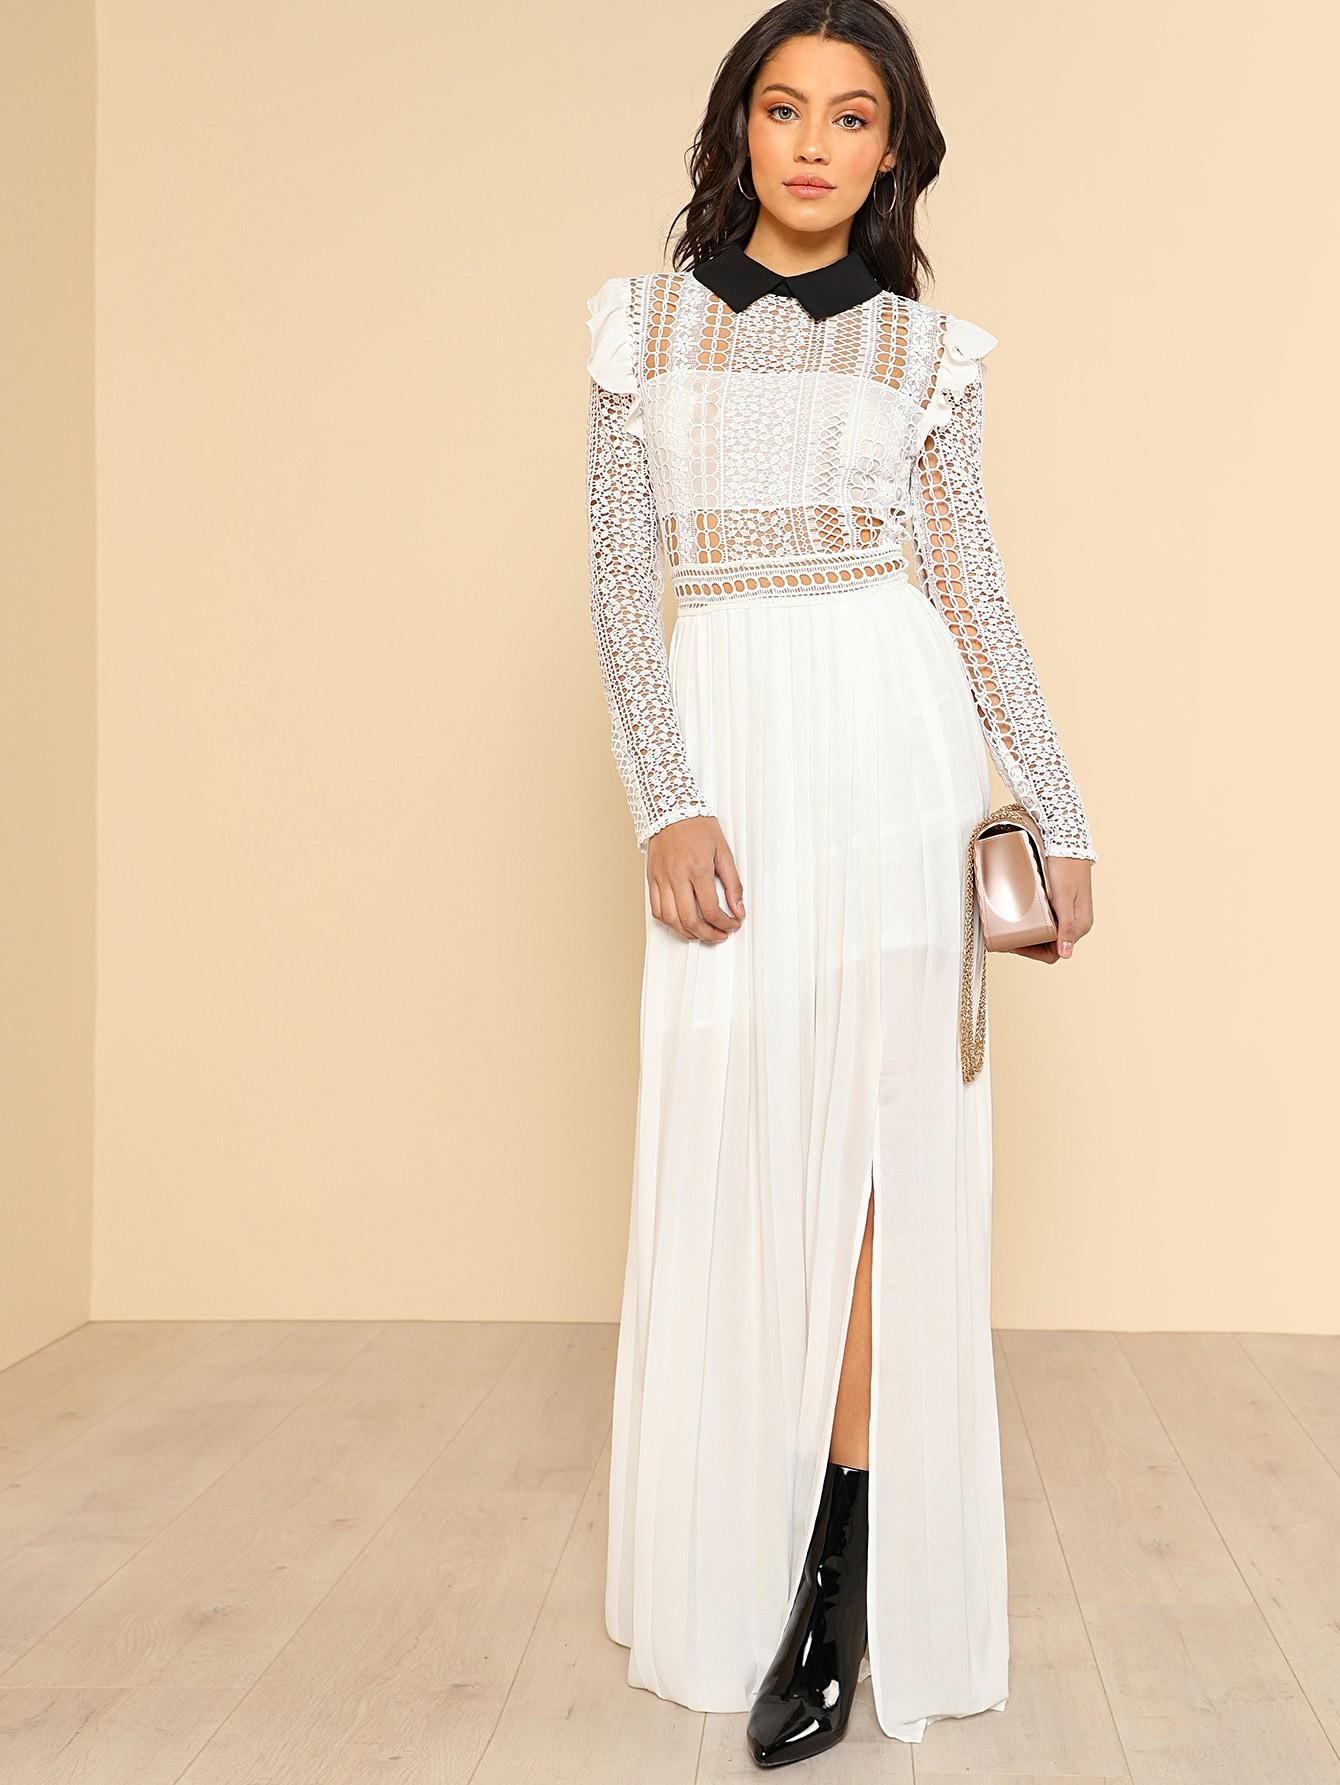 Contrast Collar Lace Bodice Pleated Dress contrast collar lace applique pleated pinstripe dress